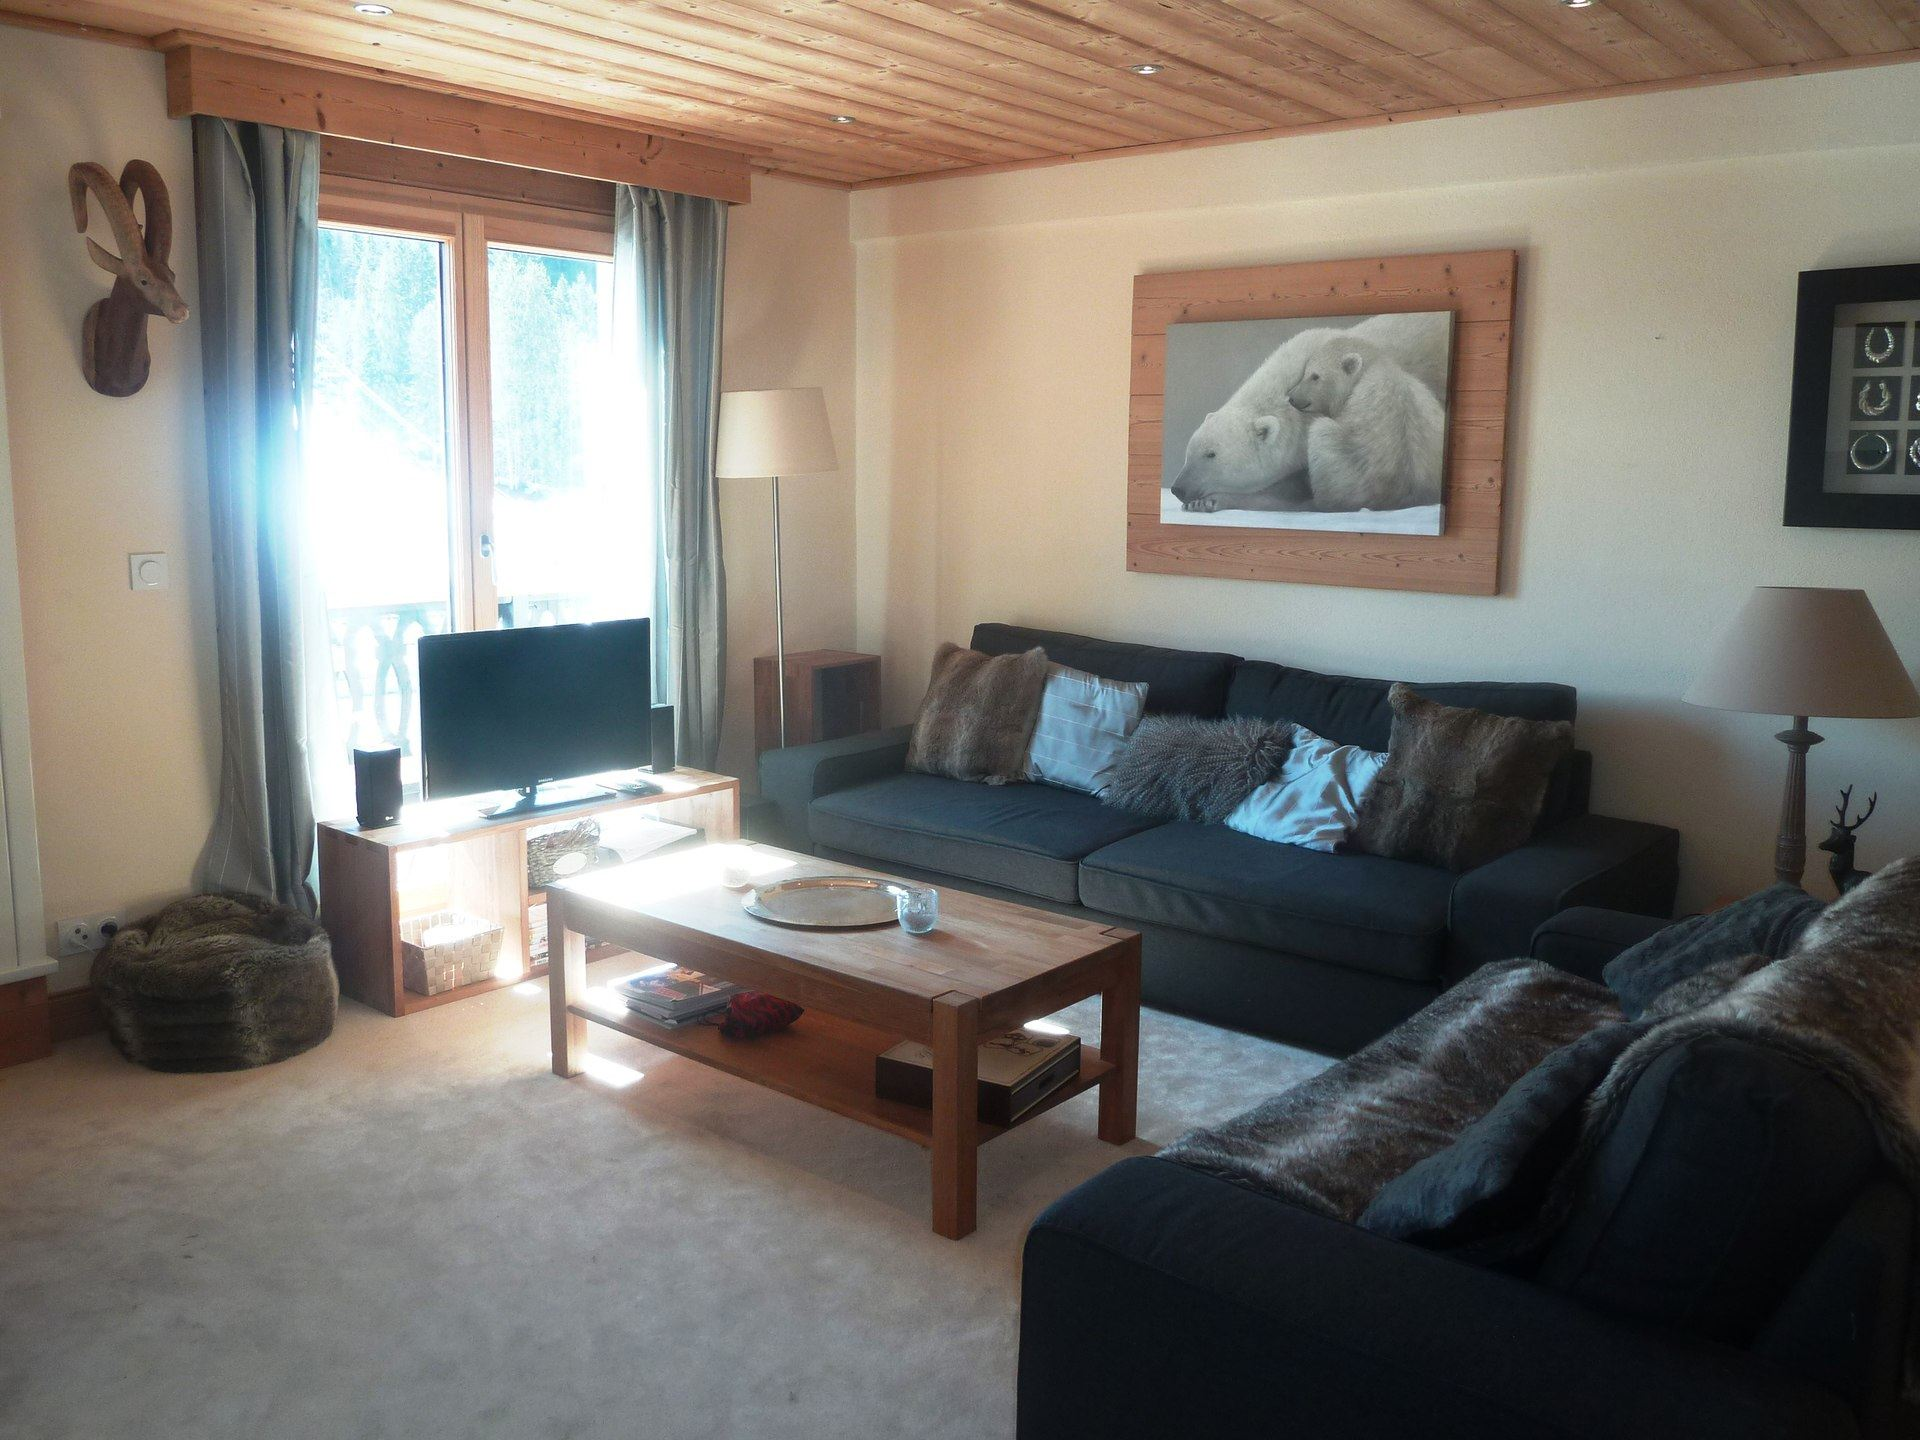 Silverstone Lodge - IS GIRO2 - 3 rooms + cabin**** - 8 people - 68m²